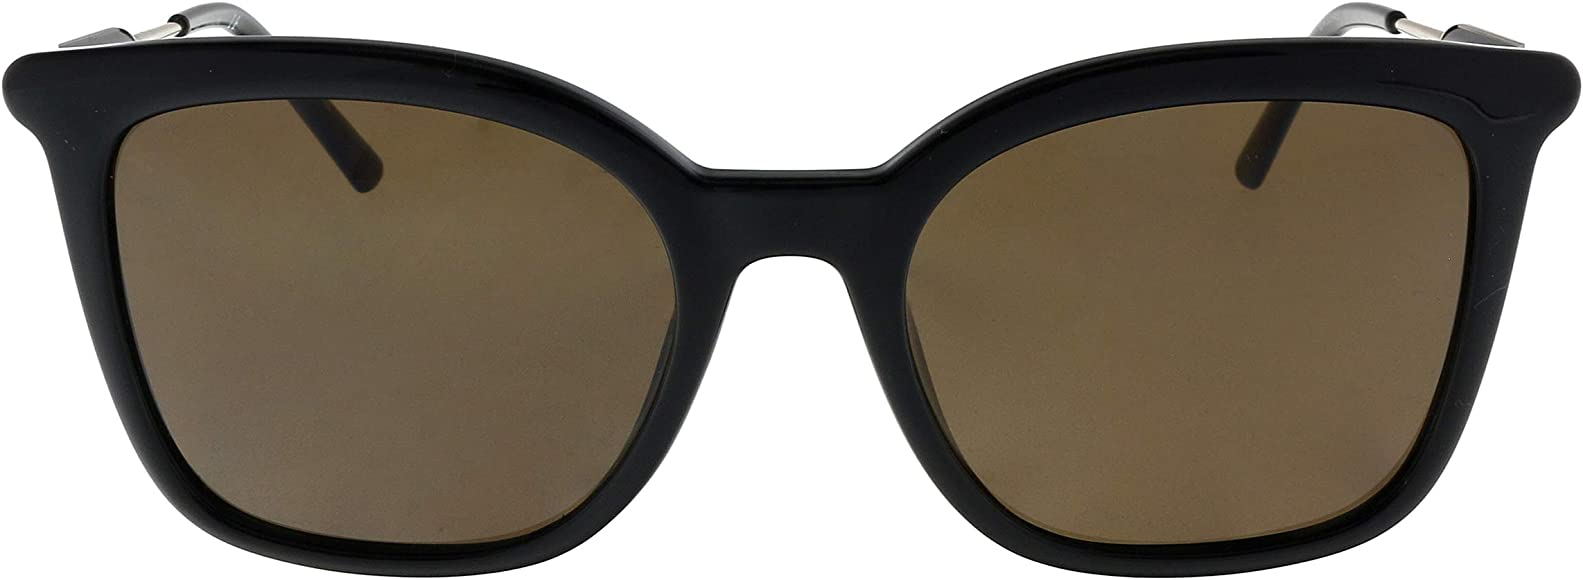 Sunglasses CK 18504 S 001 BLACK